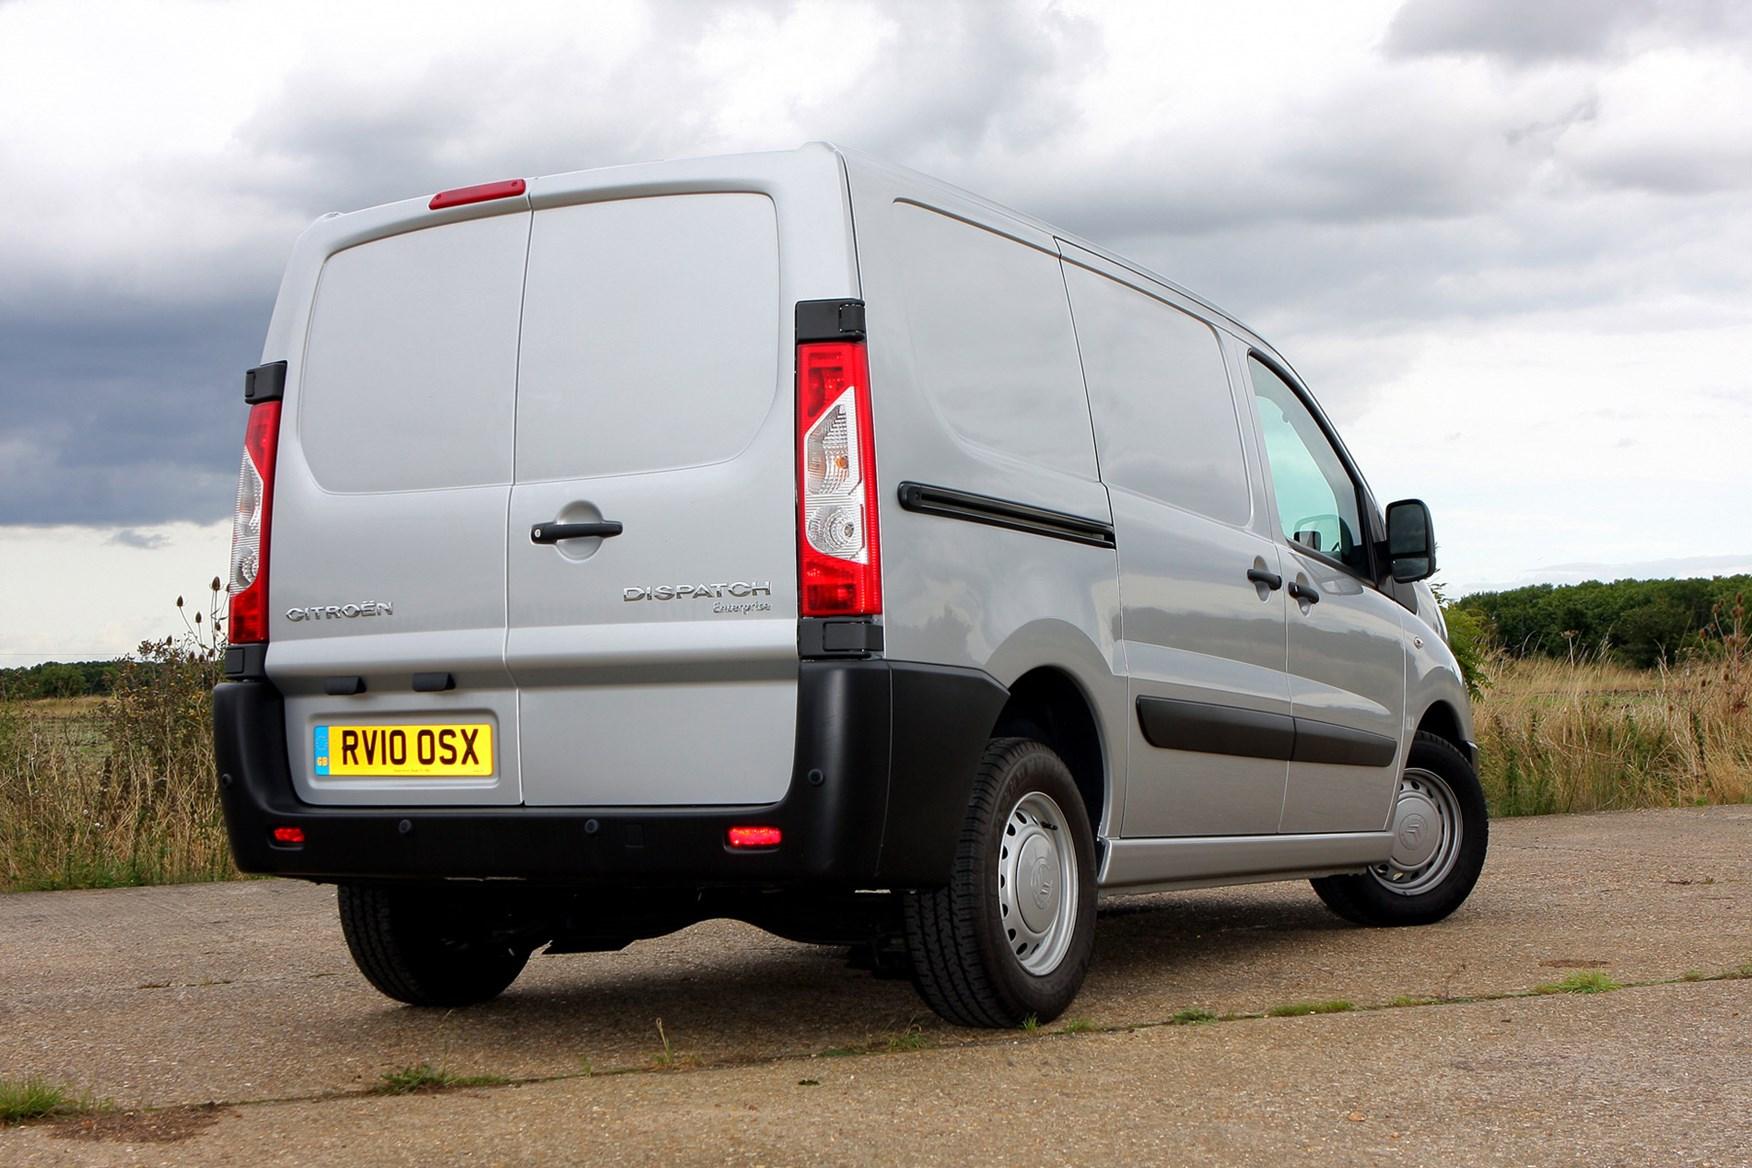 Citroen Dispatch full review on Parkers Vans - rear